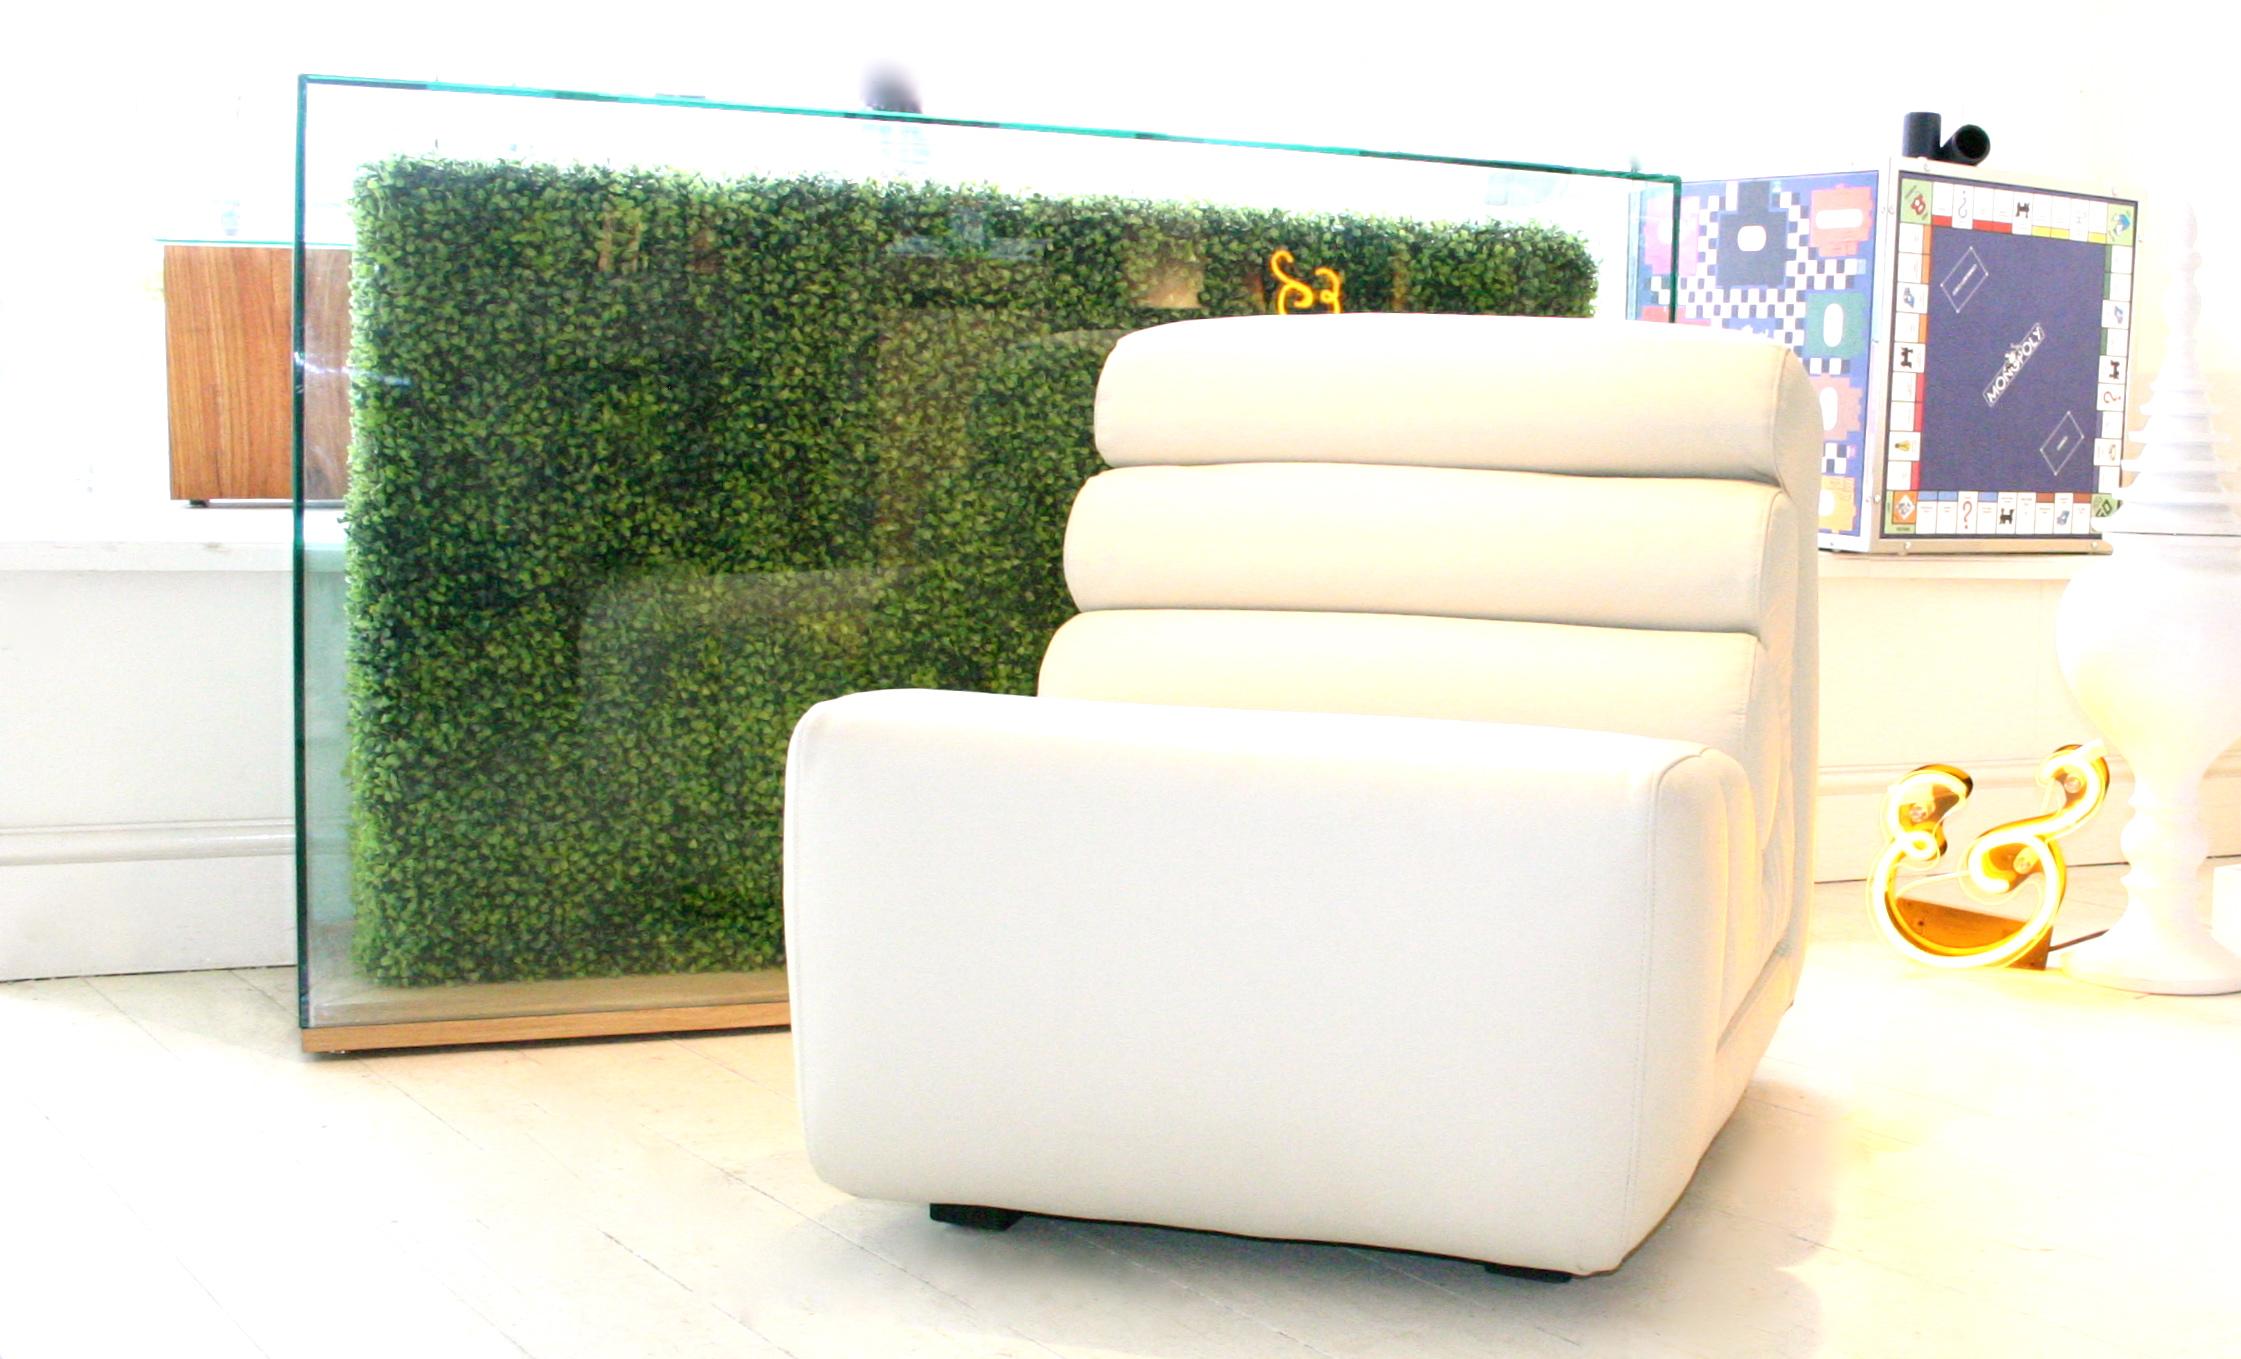 Thom Chair + Hedge colsole table.JPG